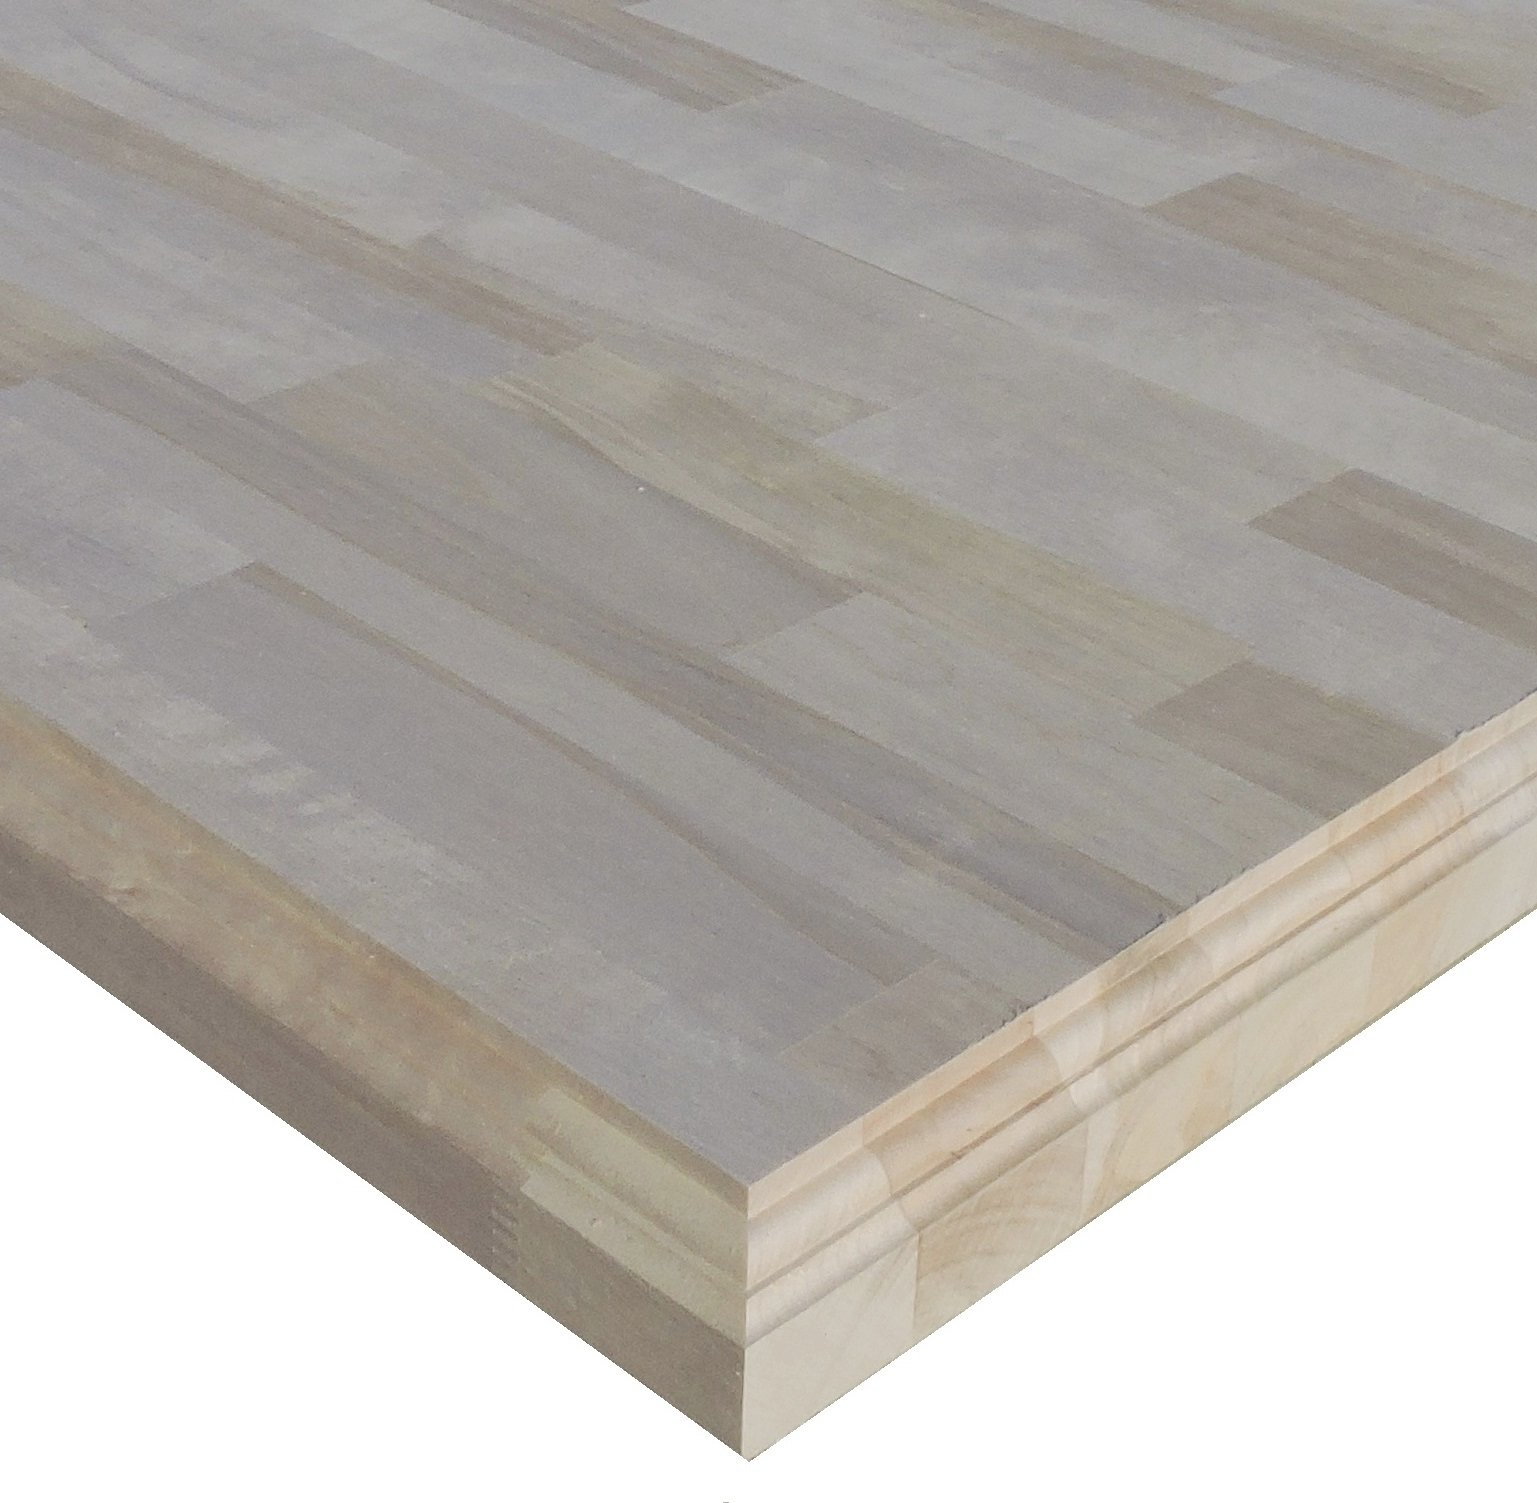 Allwood 1.5'' x 30'' x 84'' Birch Table/Counter / Island Top - Classic Roman Edges